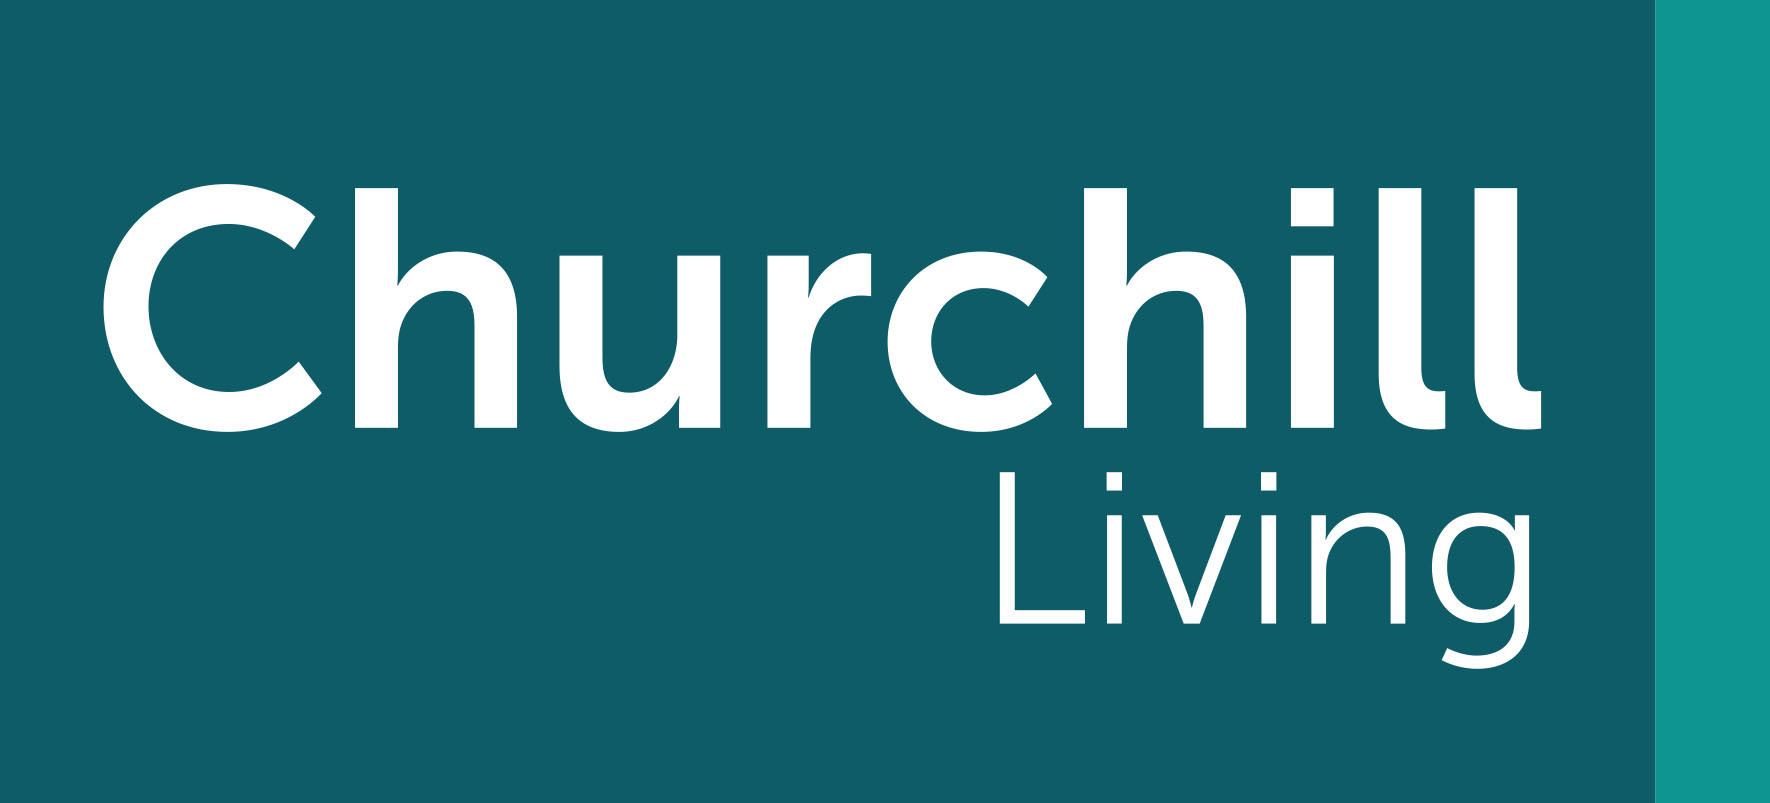 Churchill Living